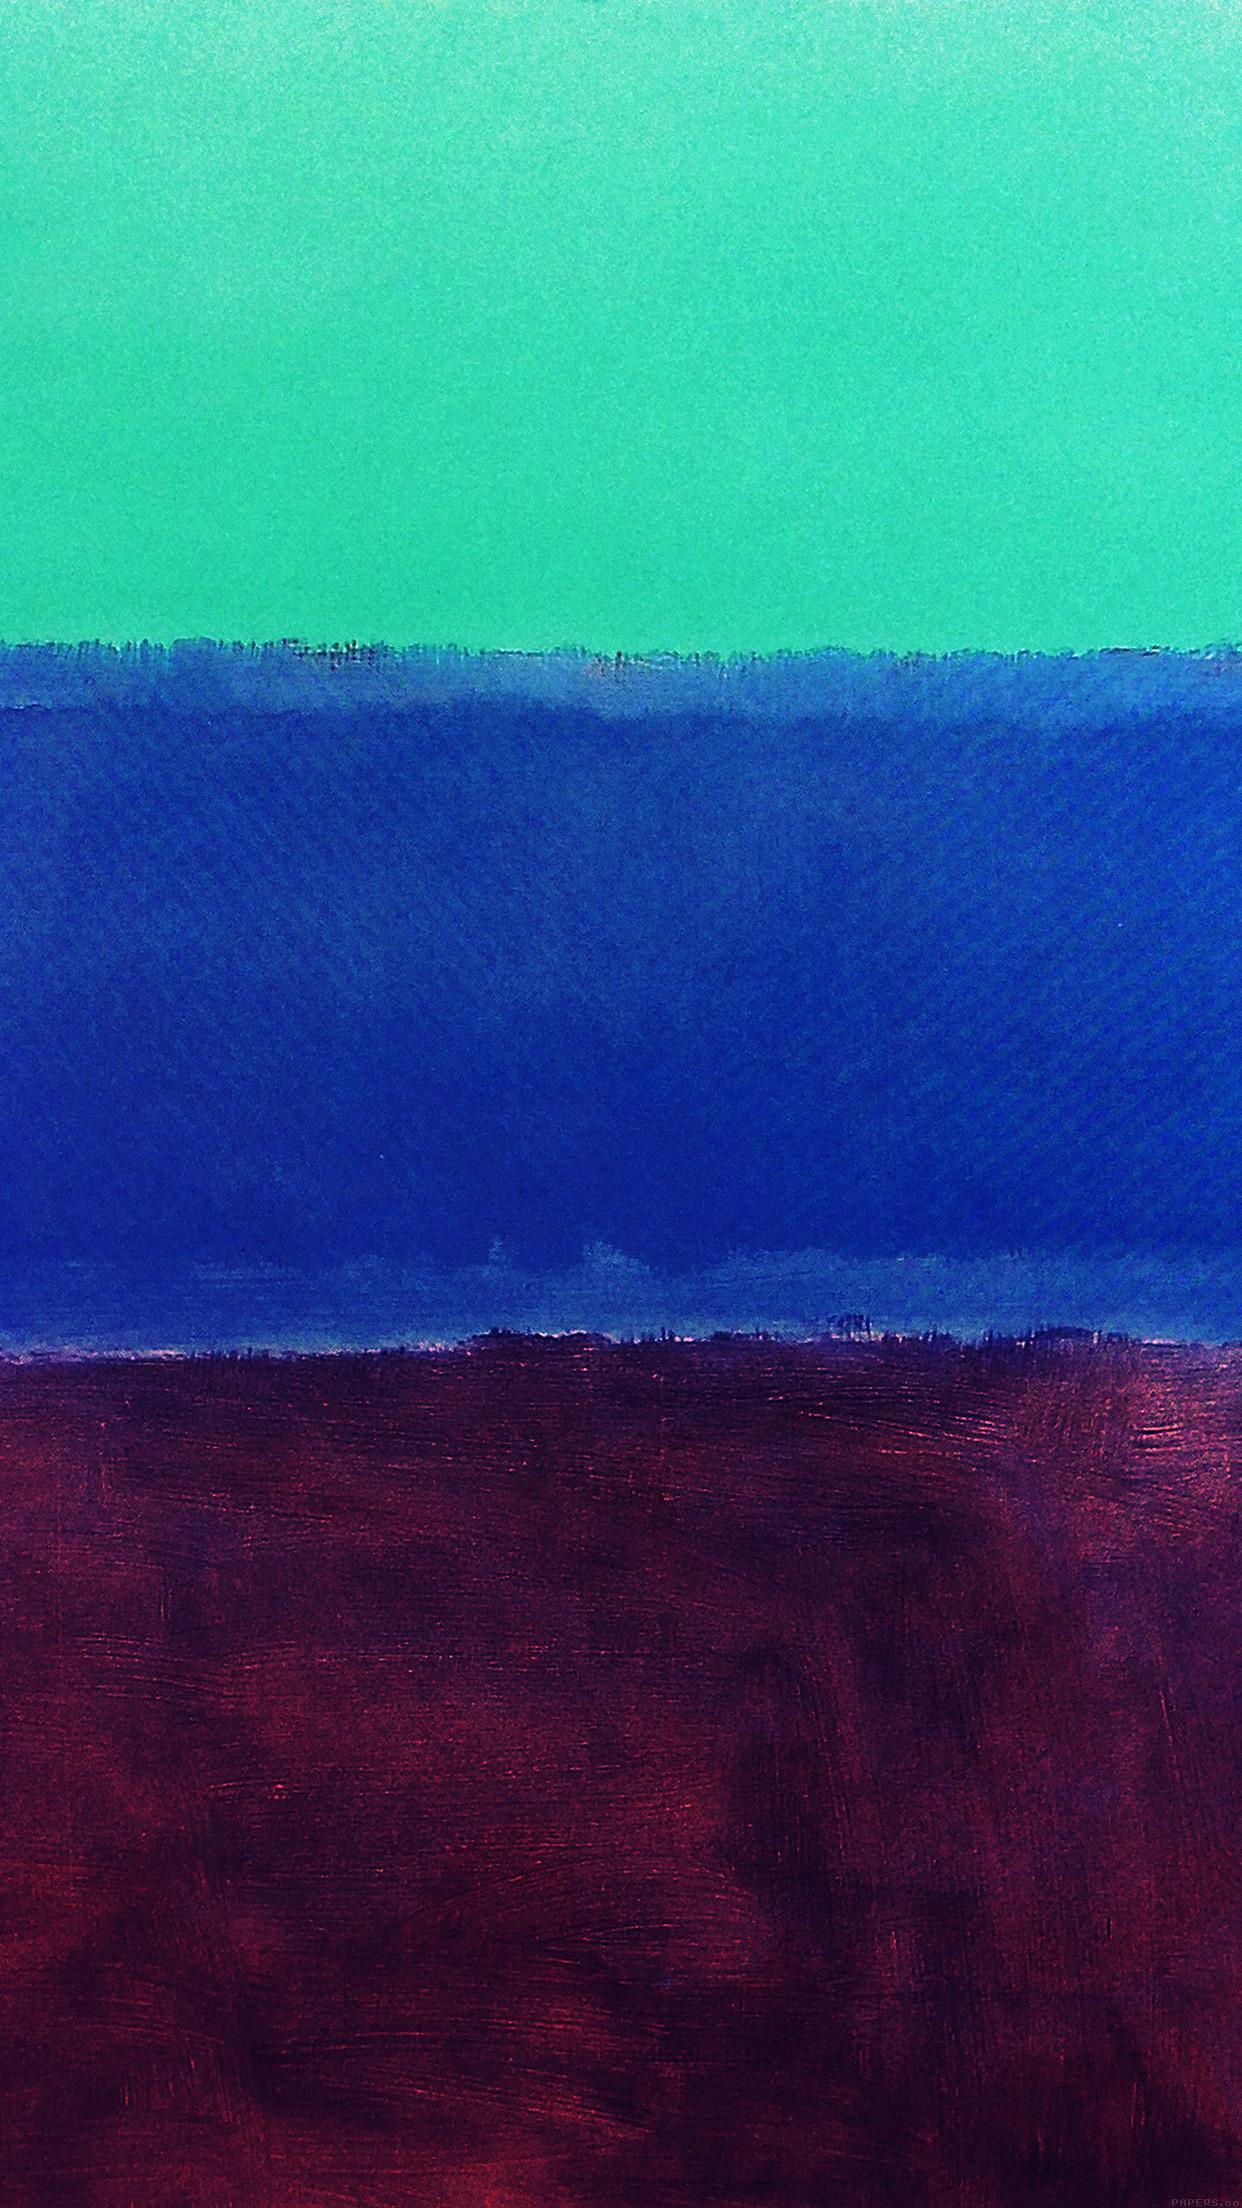 al61-mark-rothko-style-paint-art-greeb-blue-classic-wallpaper